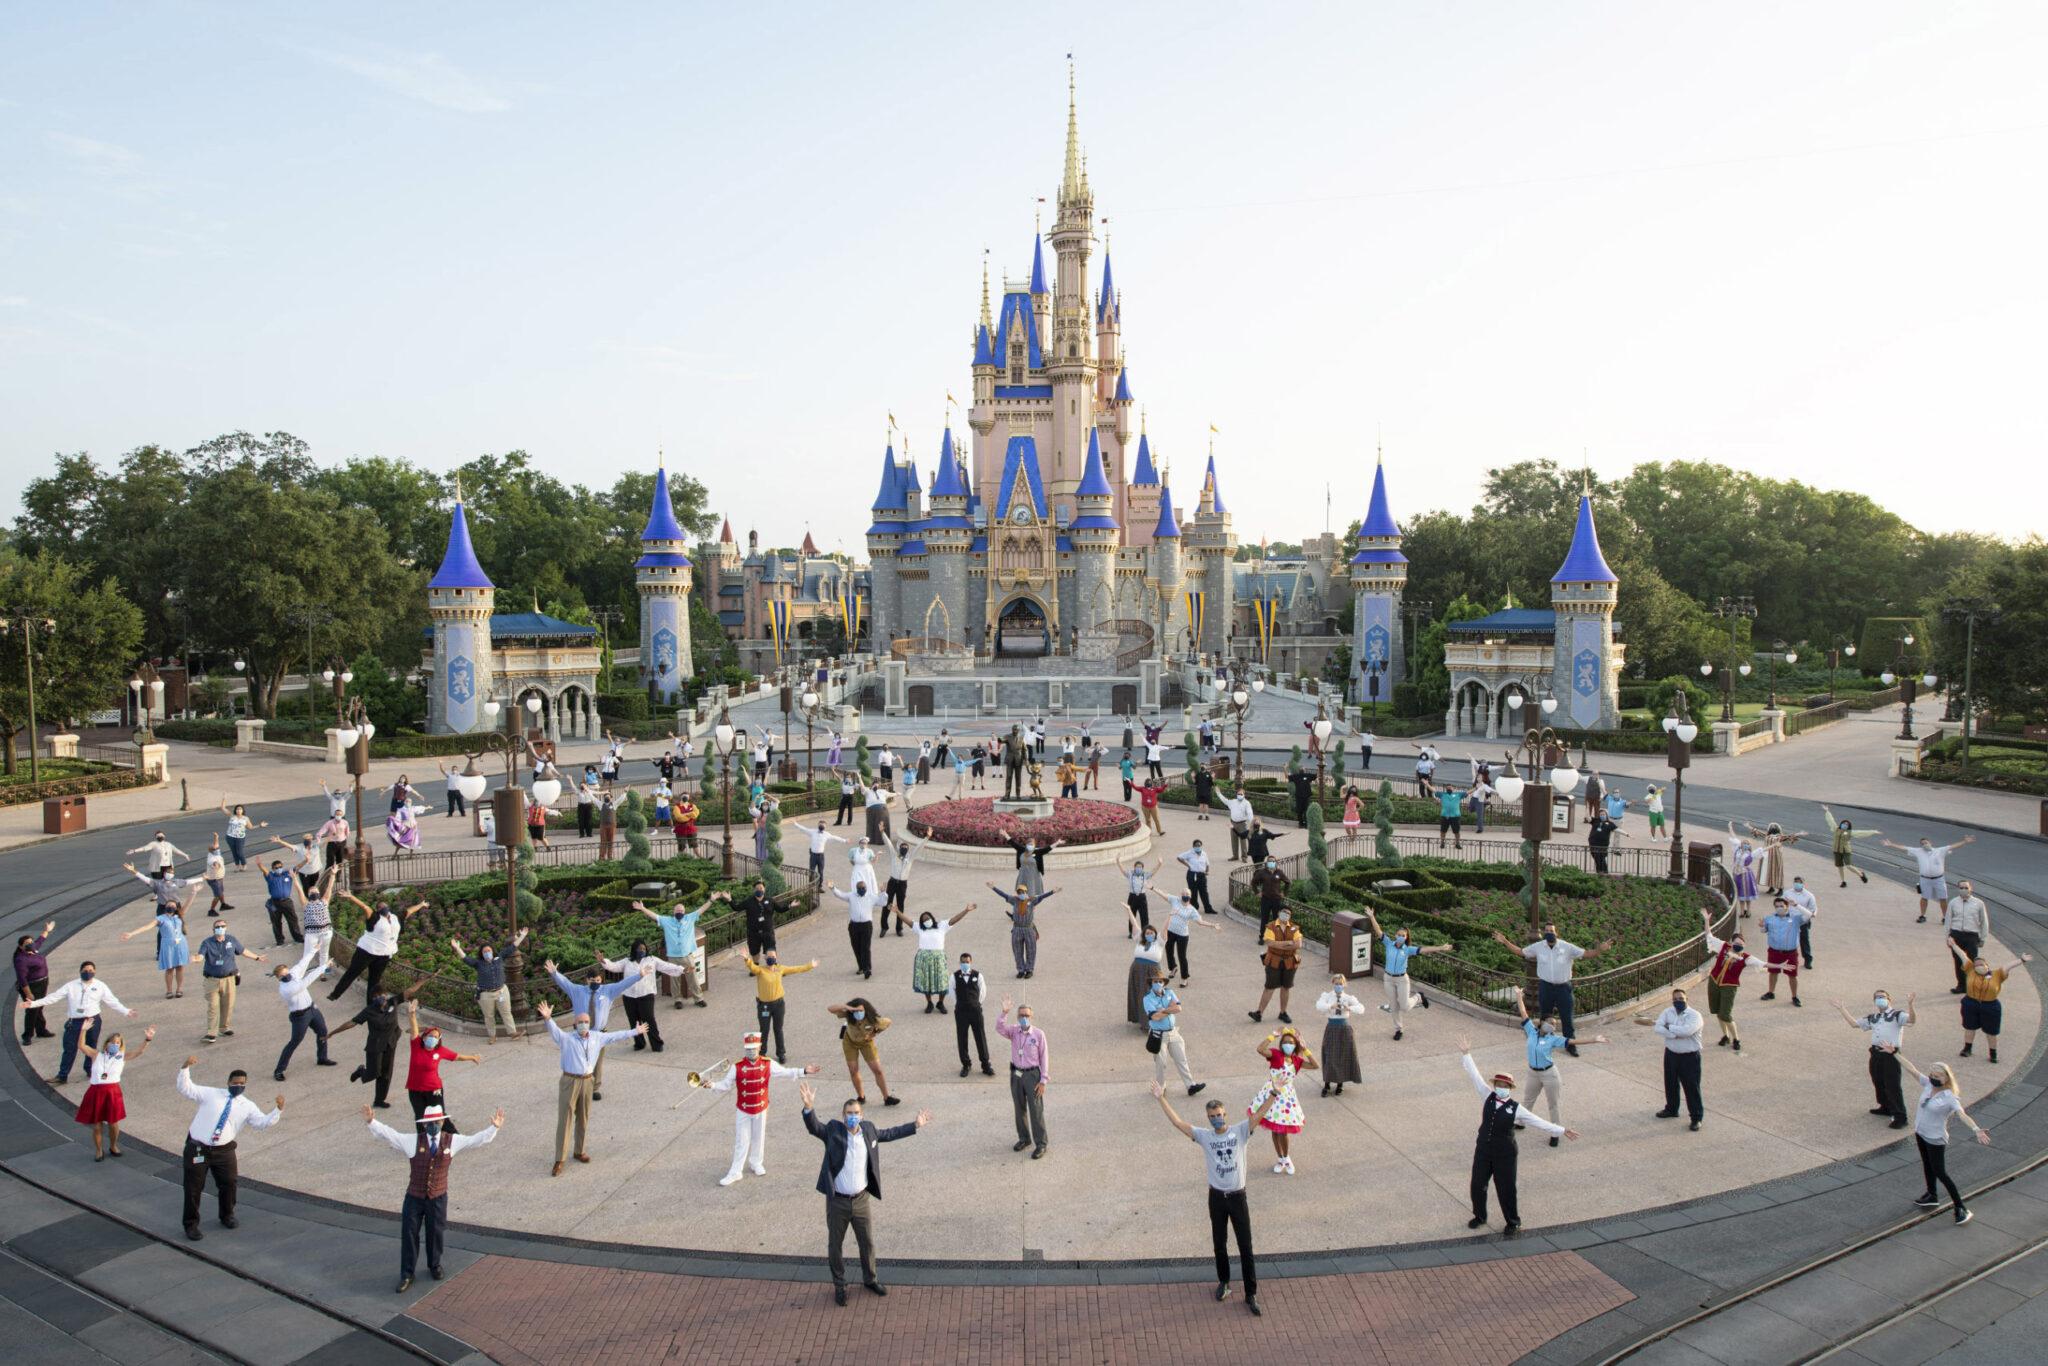 Disney Parks, Experiences, and Products, Walt Disney World, Magic Kingdom